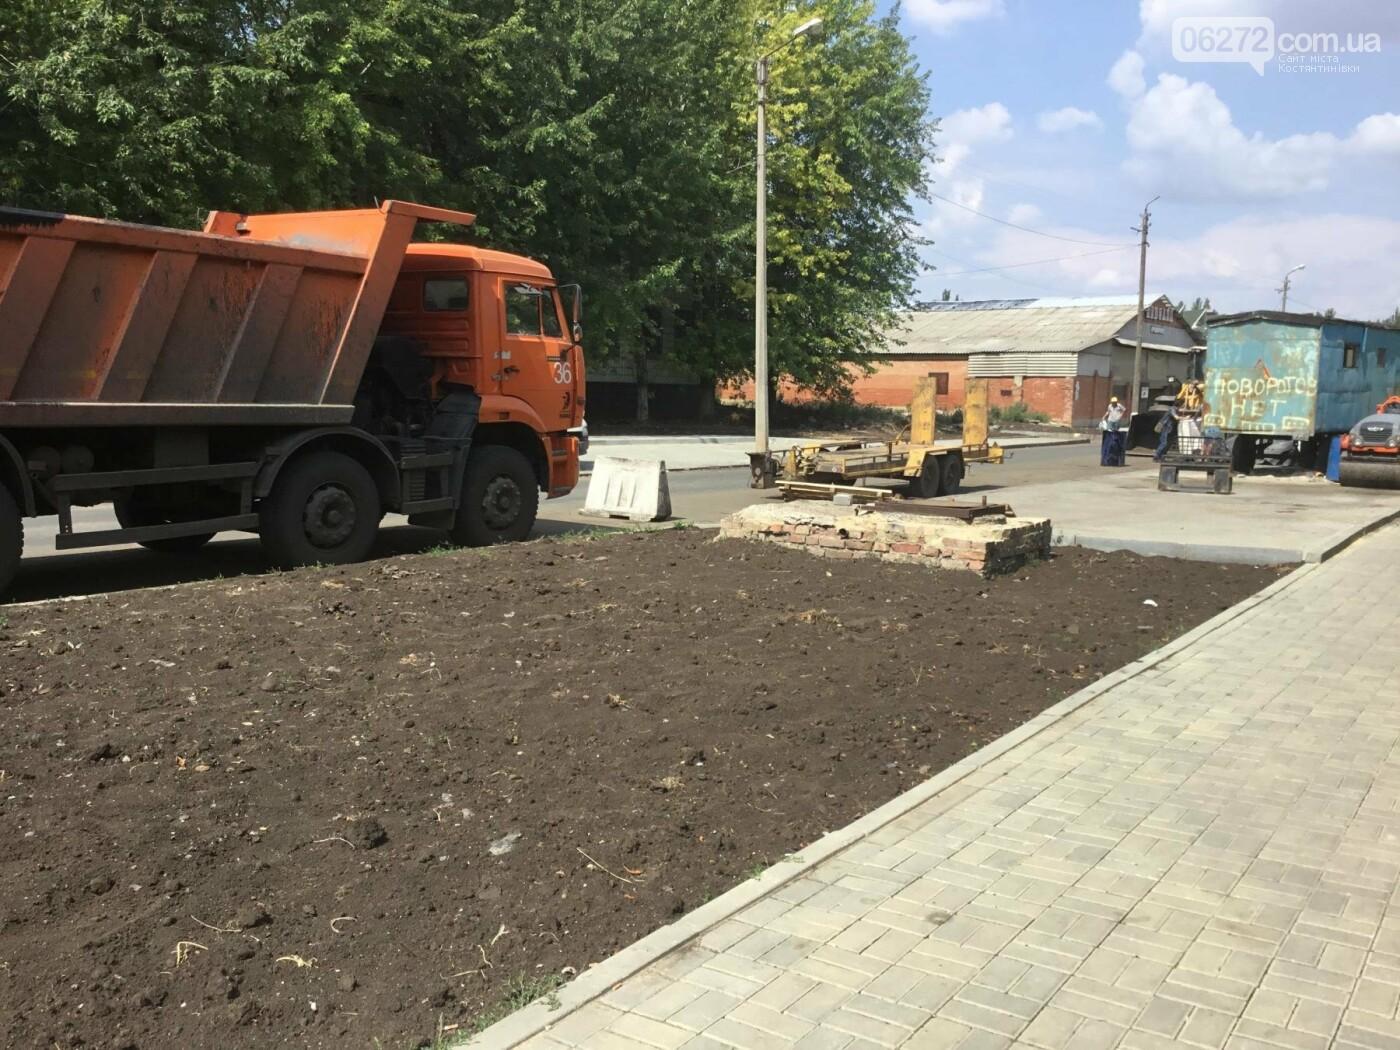 В Константиновке продолжают ремонт дорог, фото-12